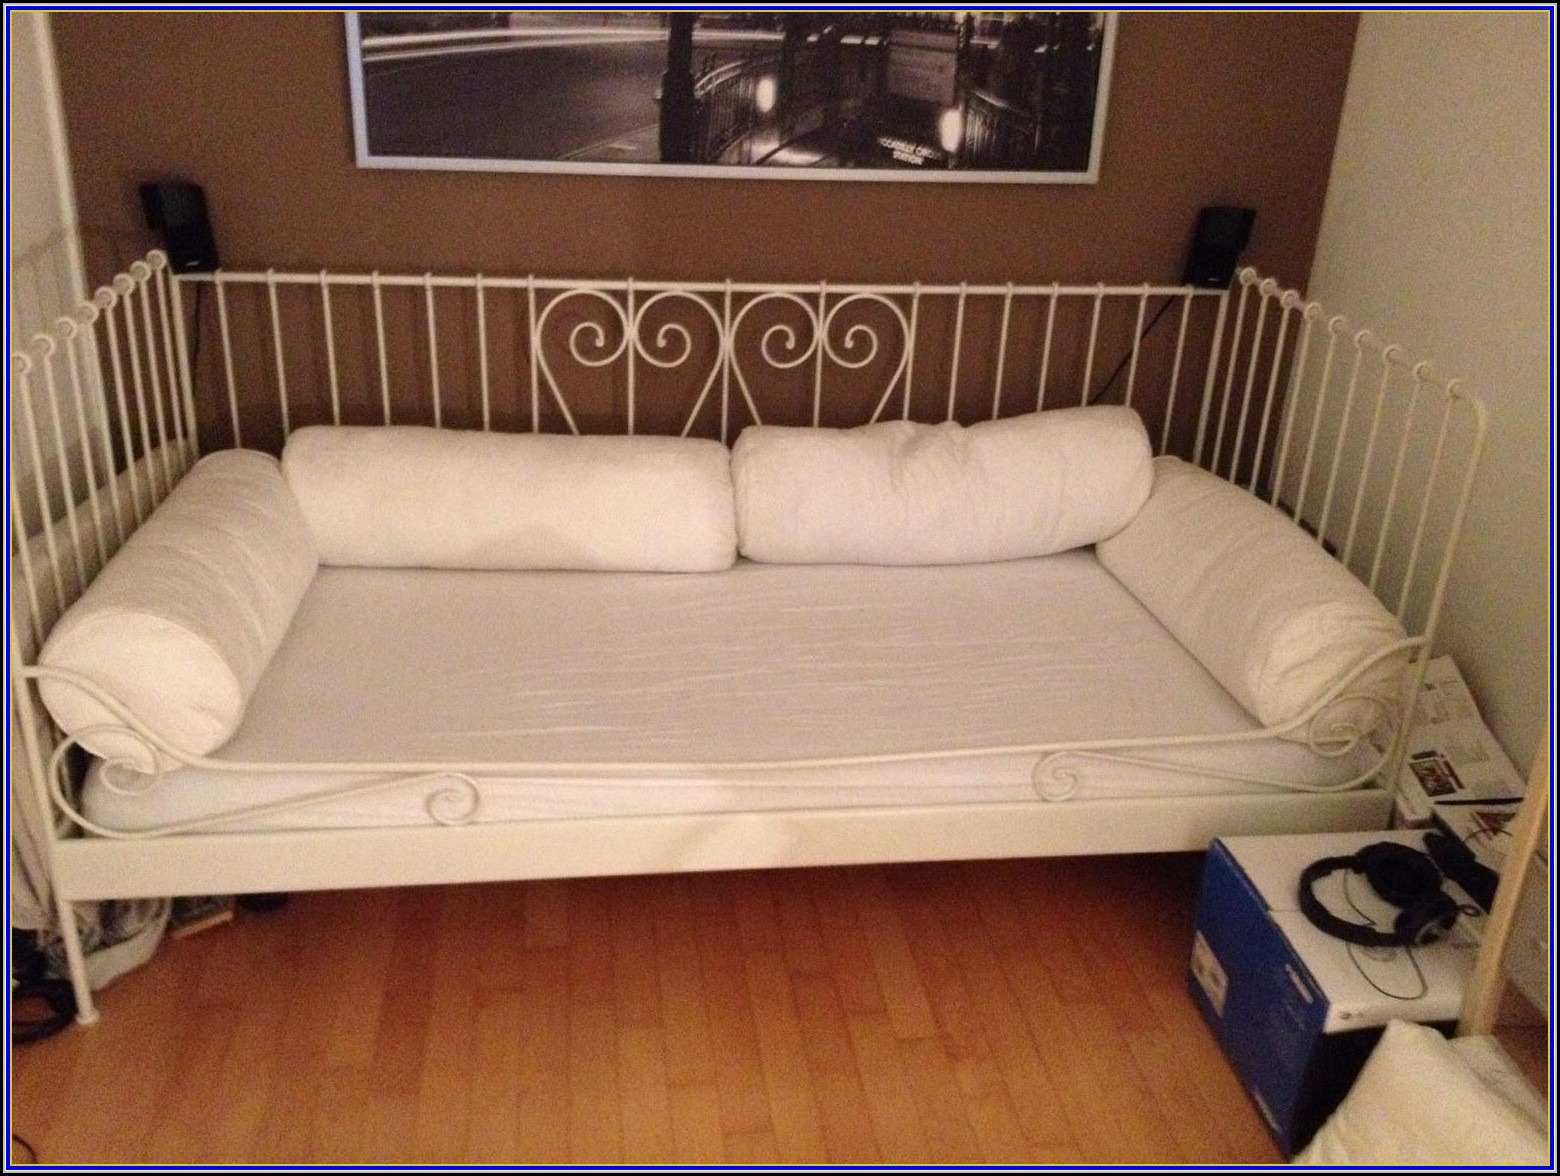 ikea bett meldal anleitung betten house und dekor galerie jvwbezgkjz. Black Bedroom Furniture Sets. Home Design Ideas